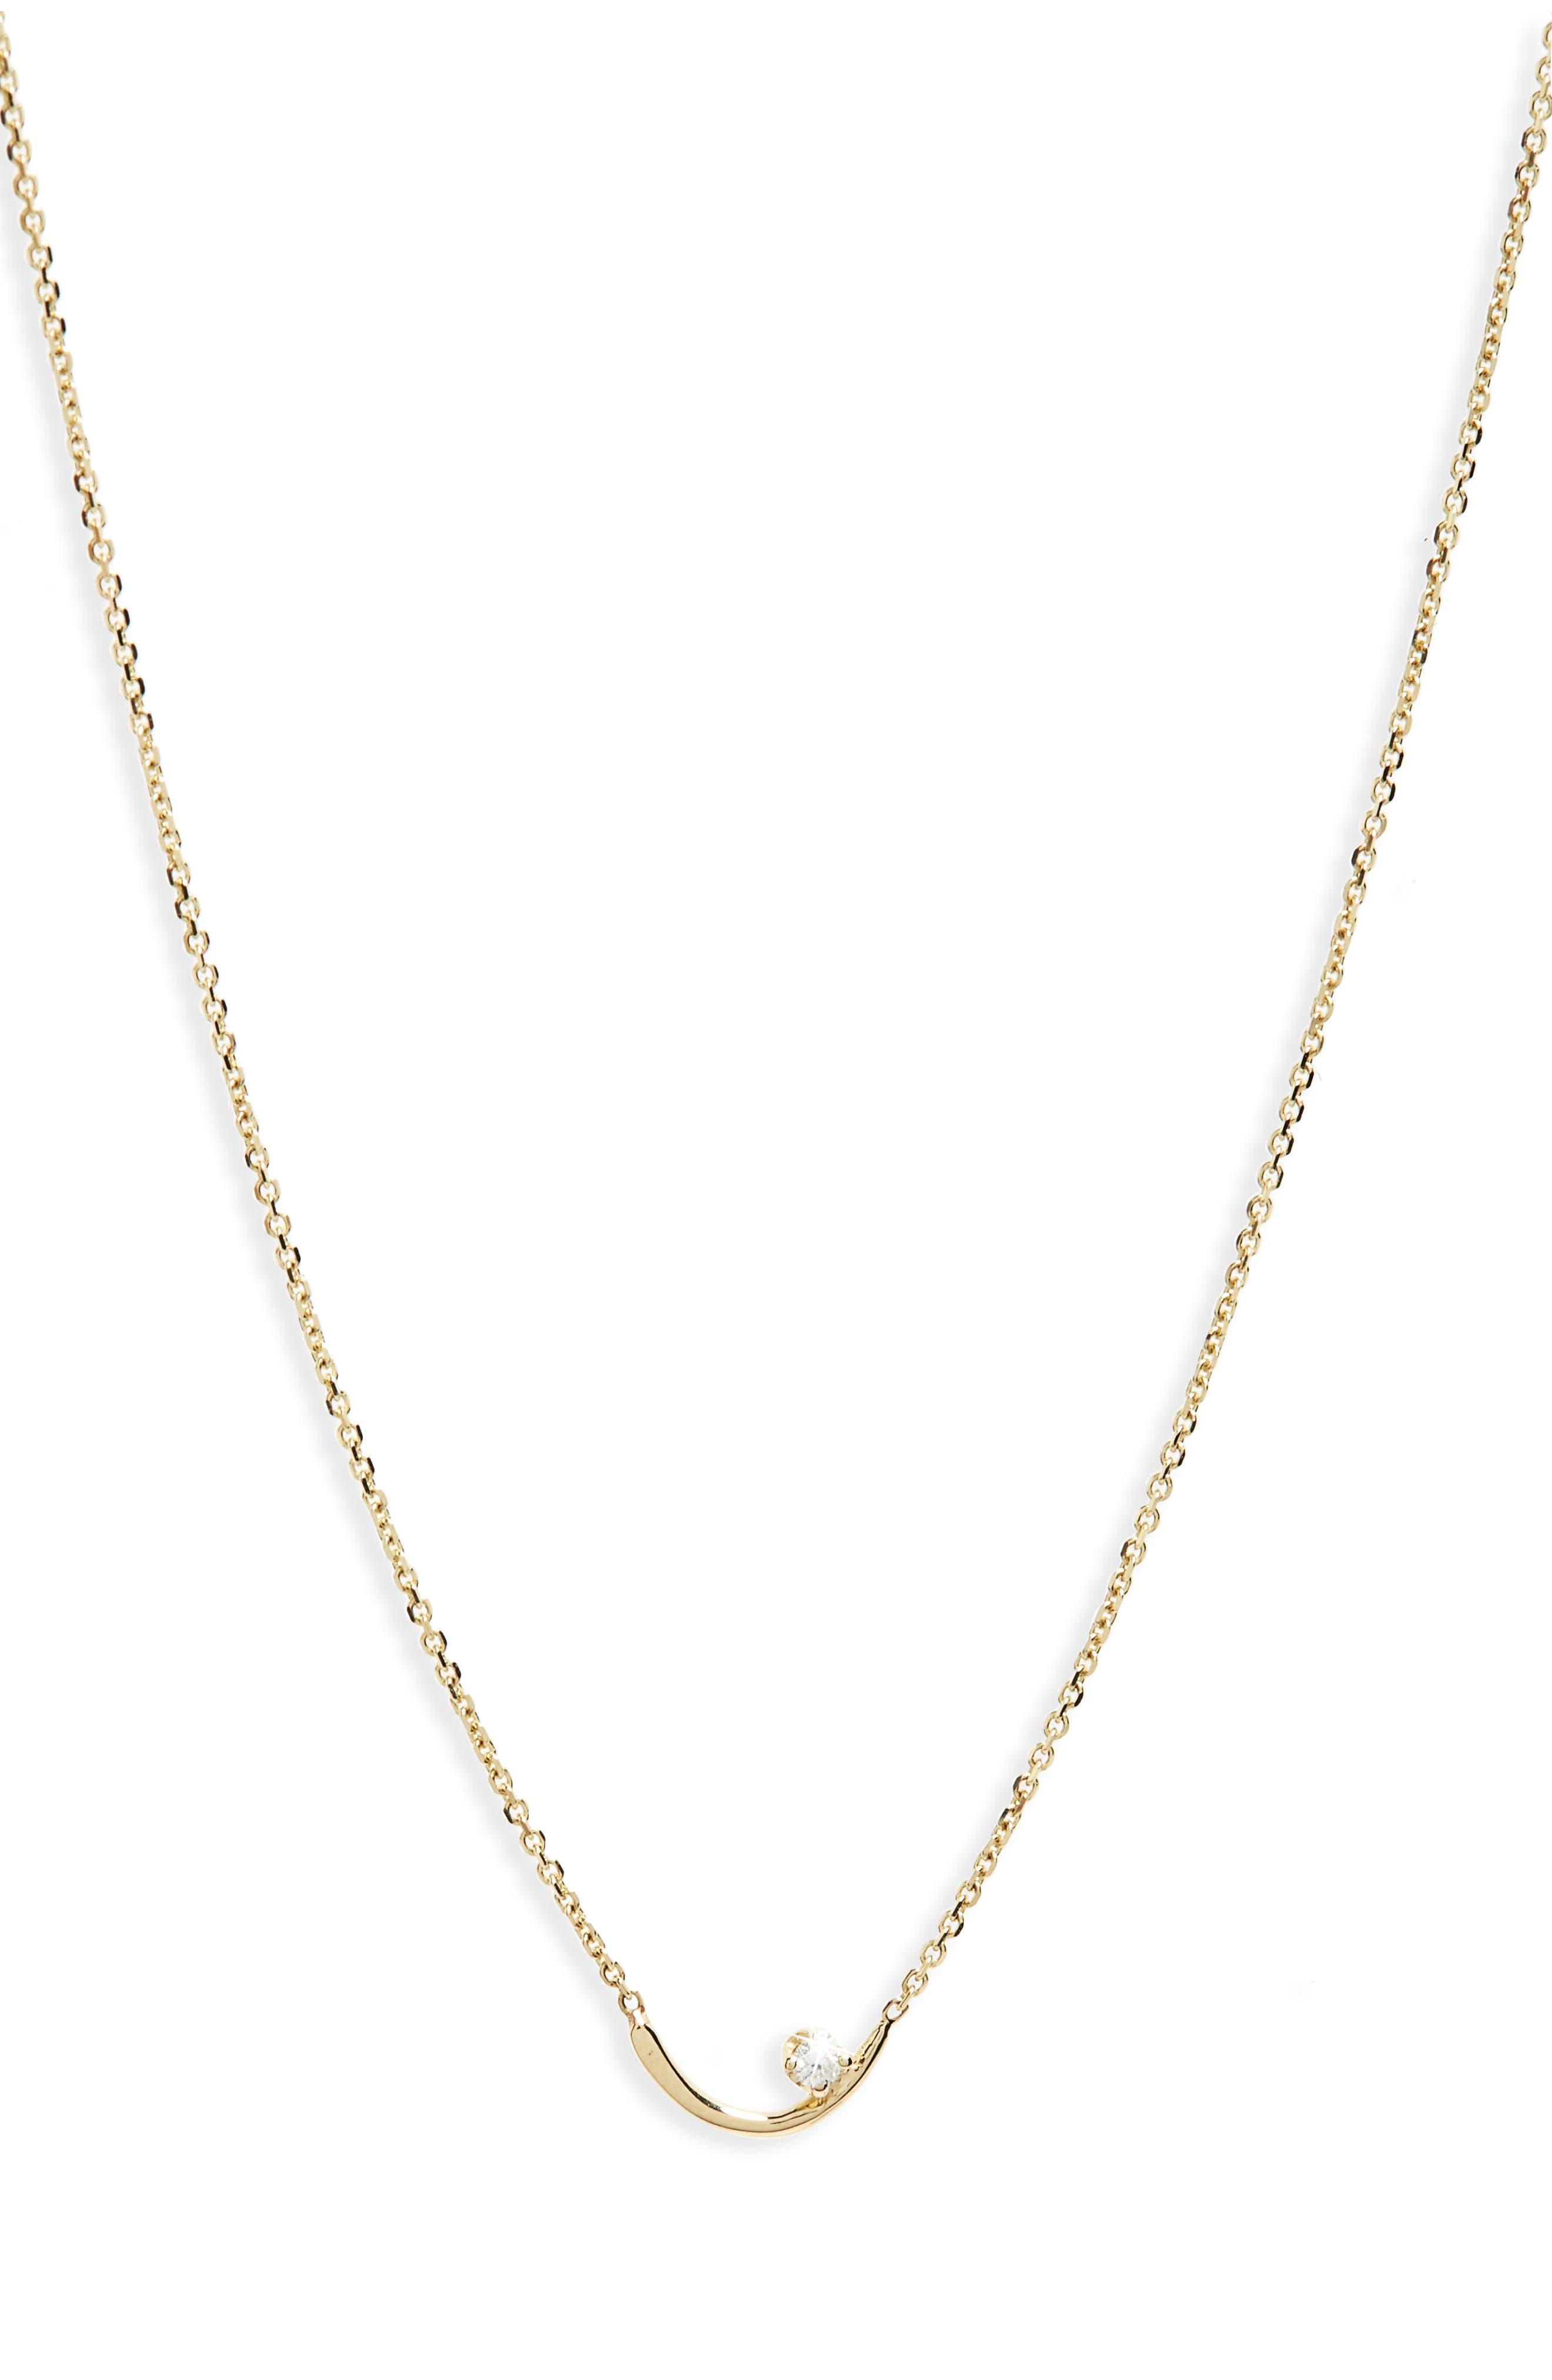 Arc Lineage Necklace, 14K Gold Chain/ White Diamond